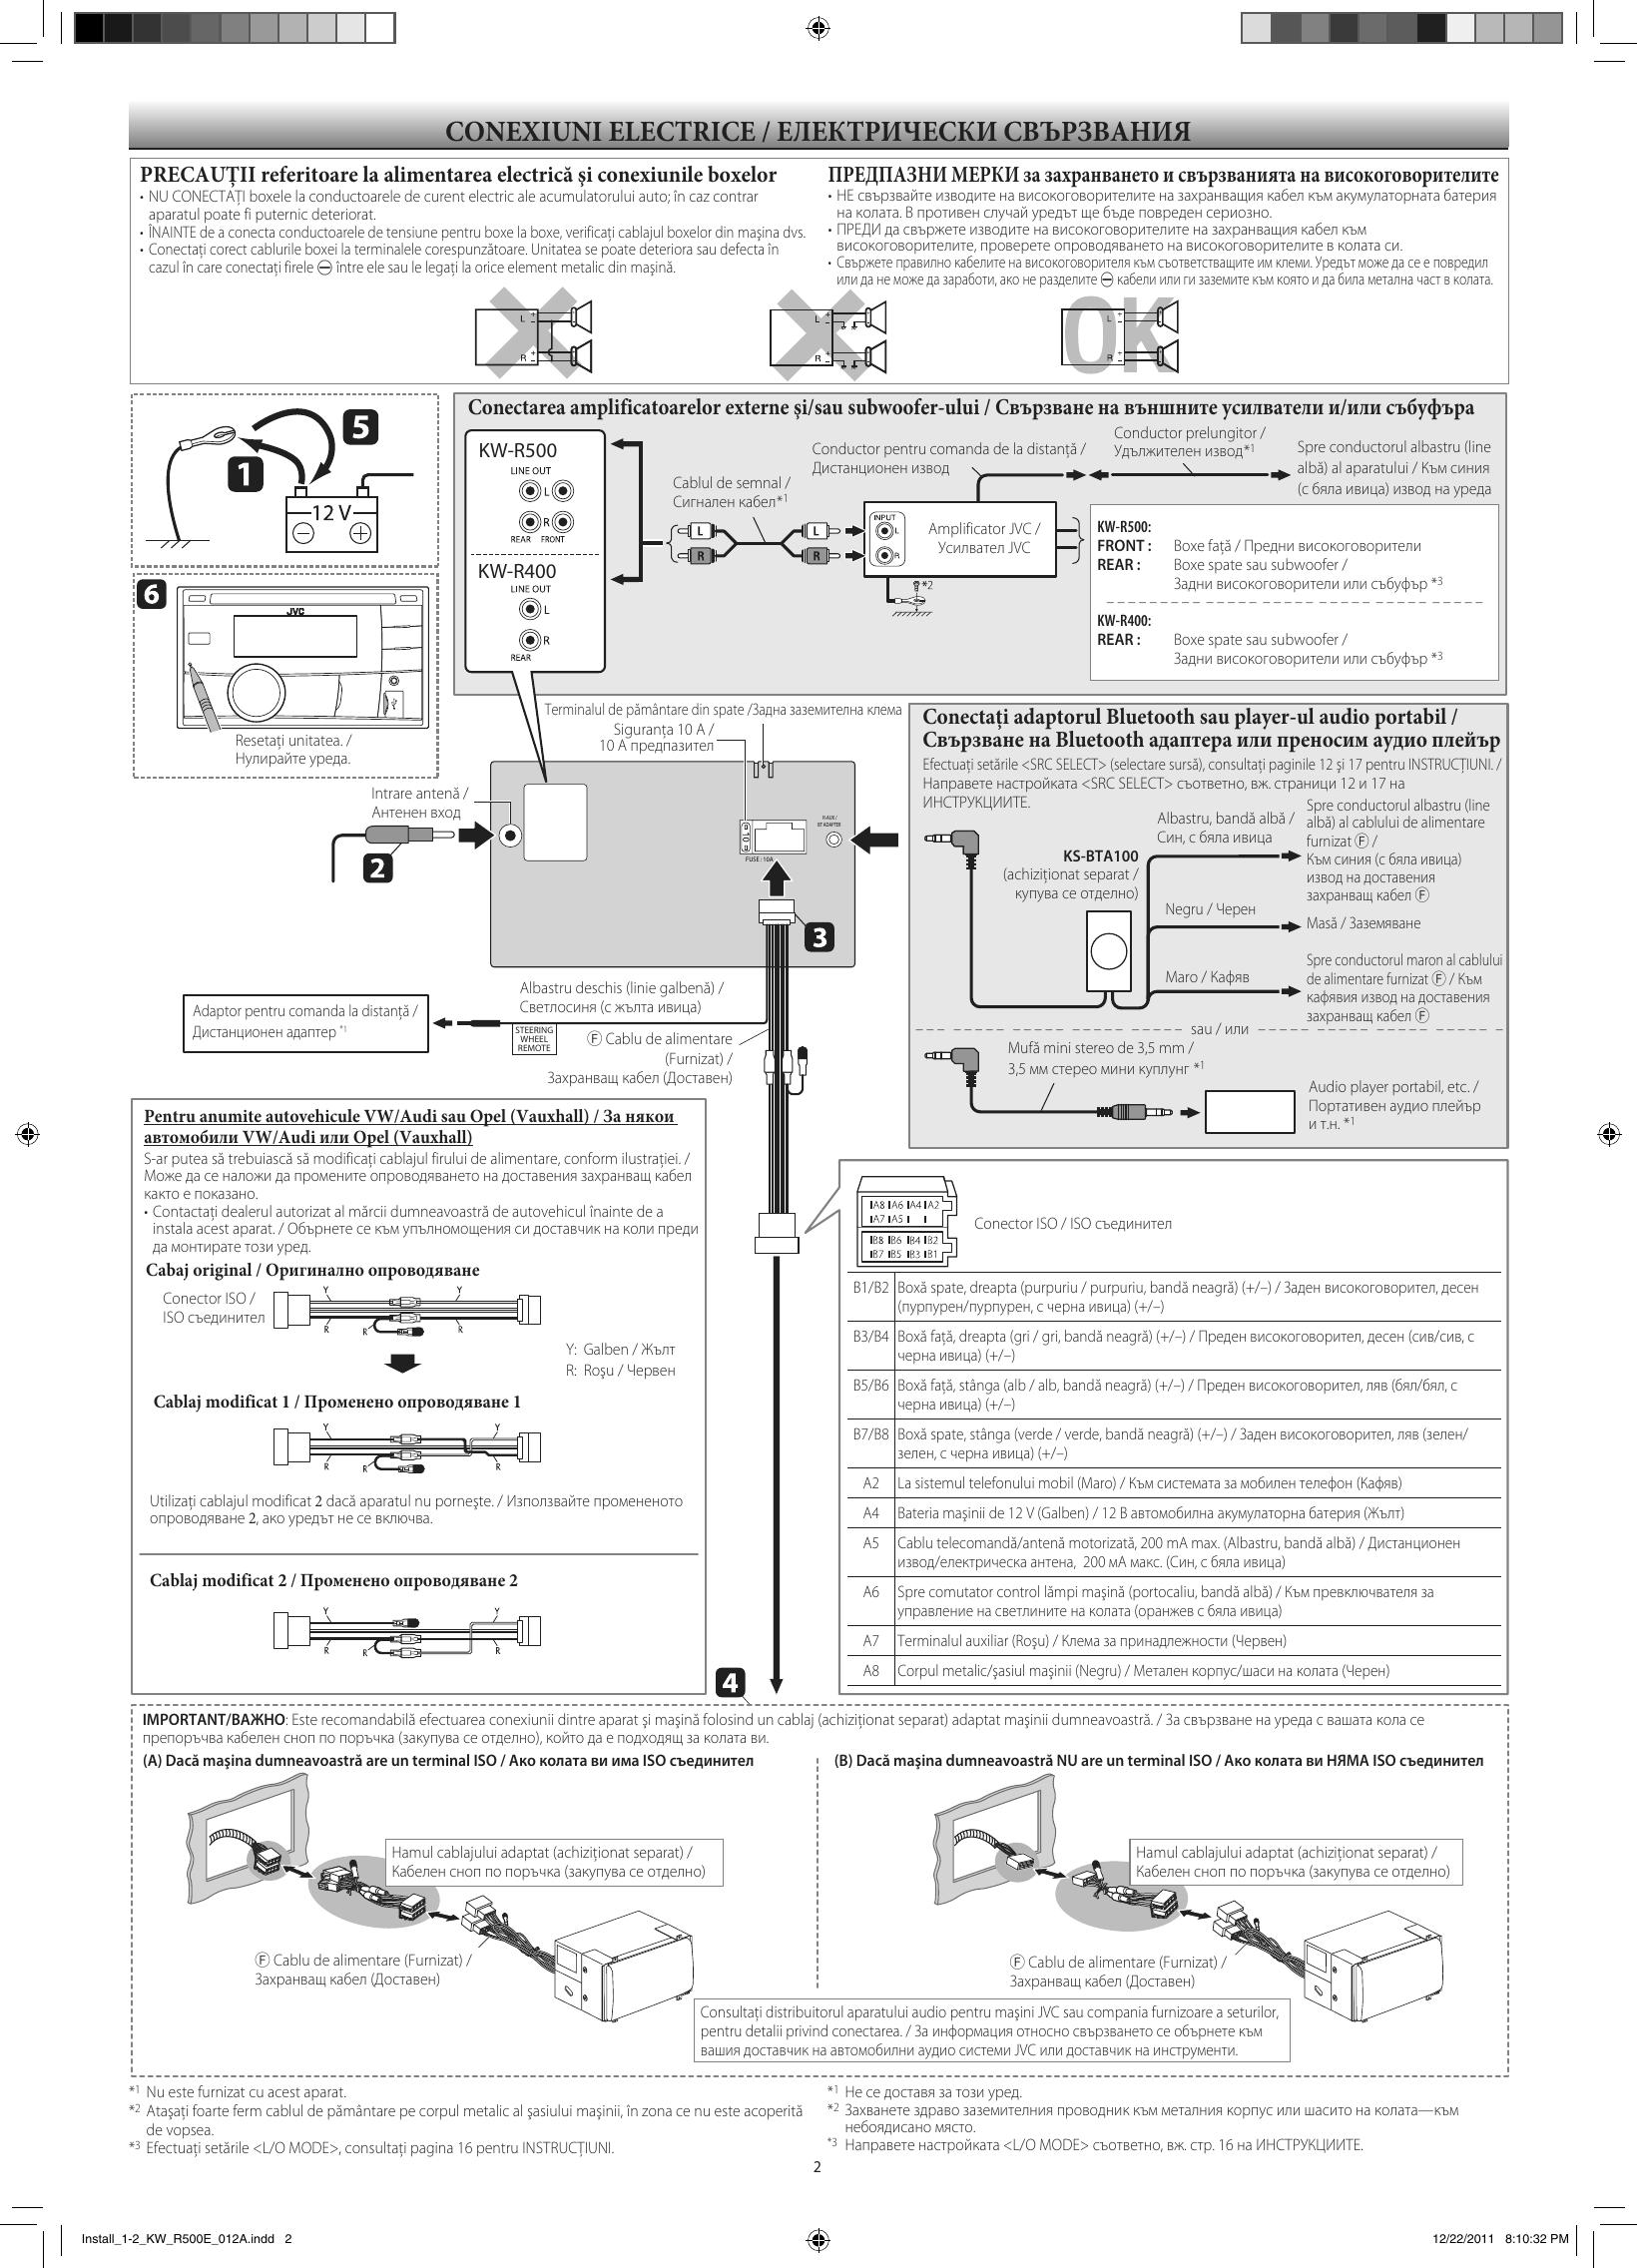 Jvc Kw 500 Wiring Schematic - 96 Chrysler Sebring Fuse Box Diagram -  800sss.yenpancane.jeanjaures37.fr | Jvc Kw R500 Car Stereo Wiring Diagram |  | Wiring Diagram Resource